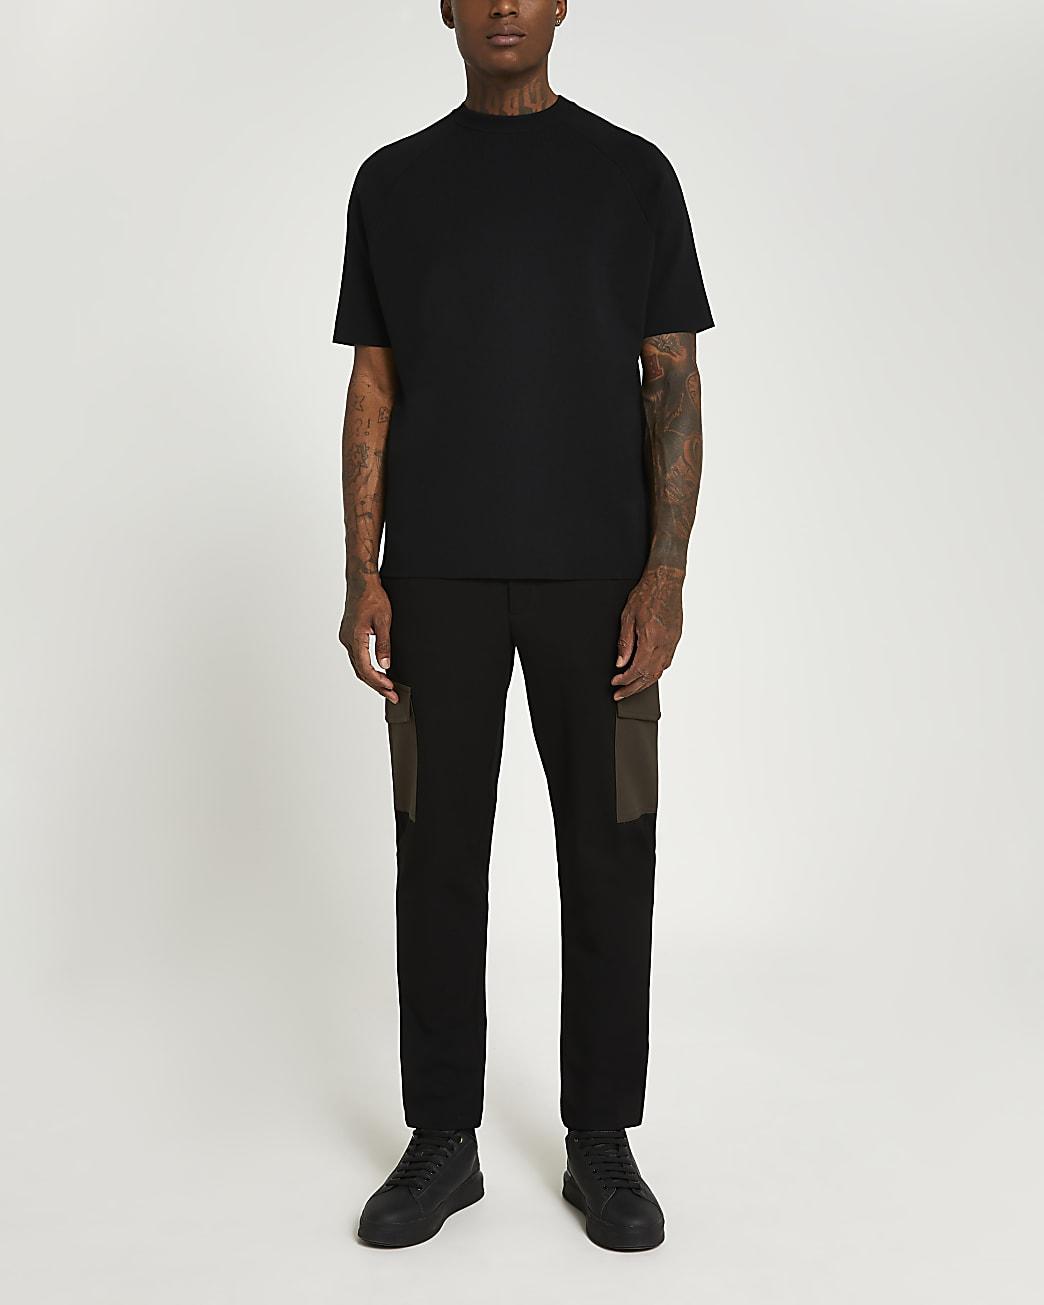 Black slim fit contrast pocket cargo trousers